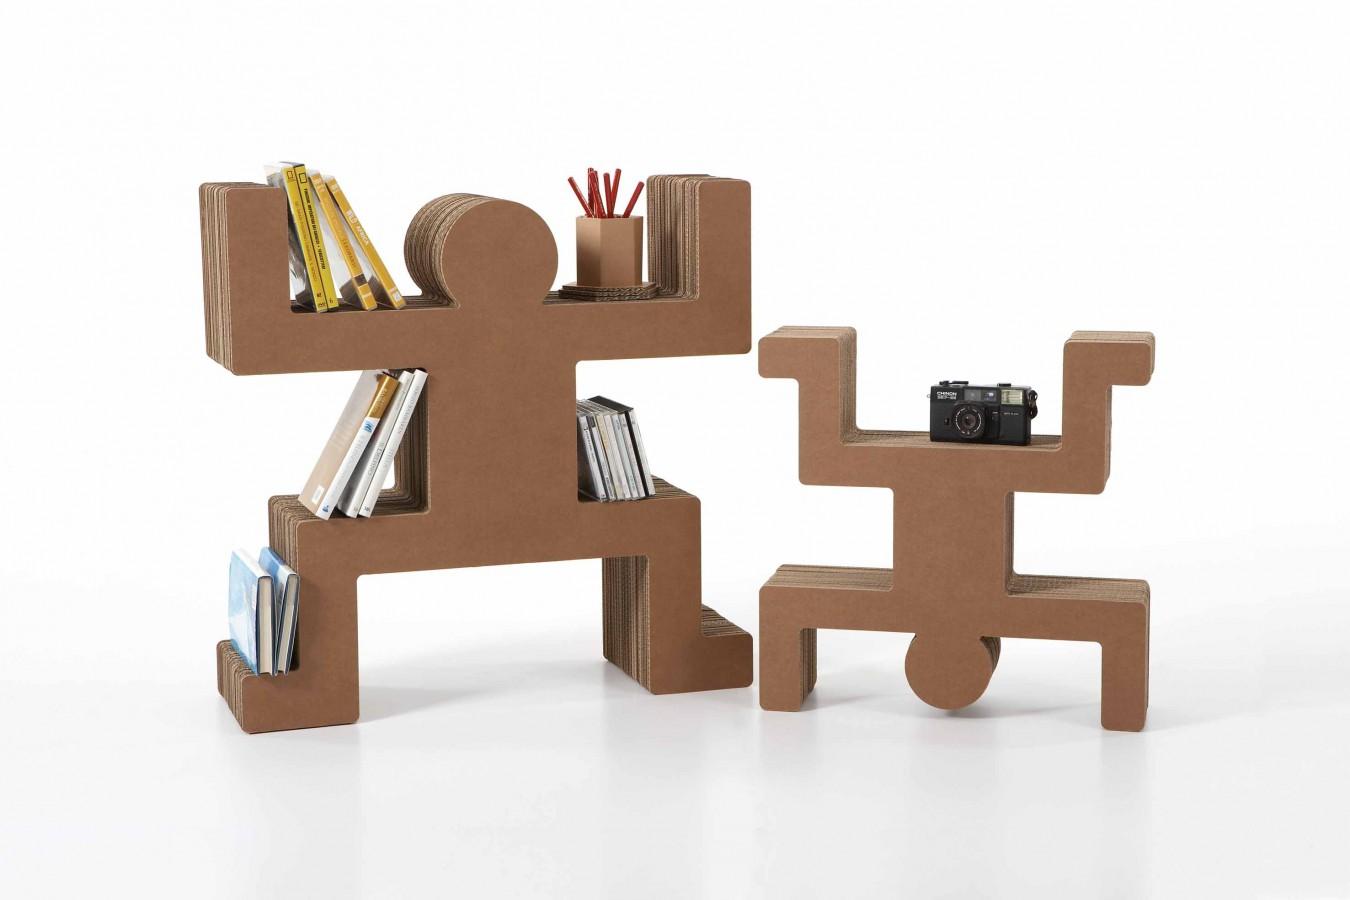 Spanky Cardboard Shelving For A Kids Room Kidsomania - Cardboard-bookshelves